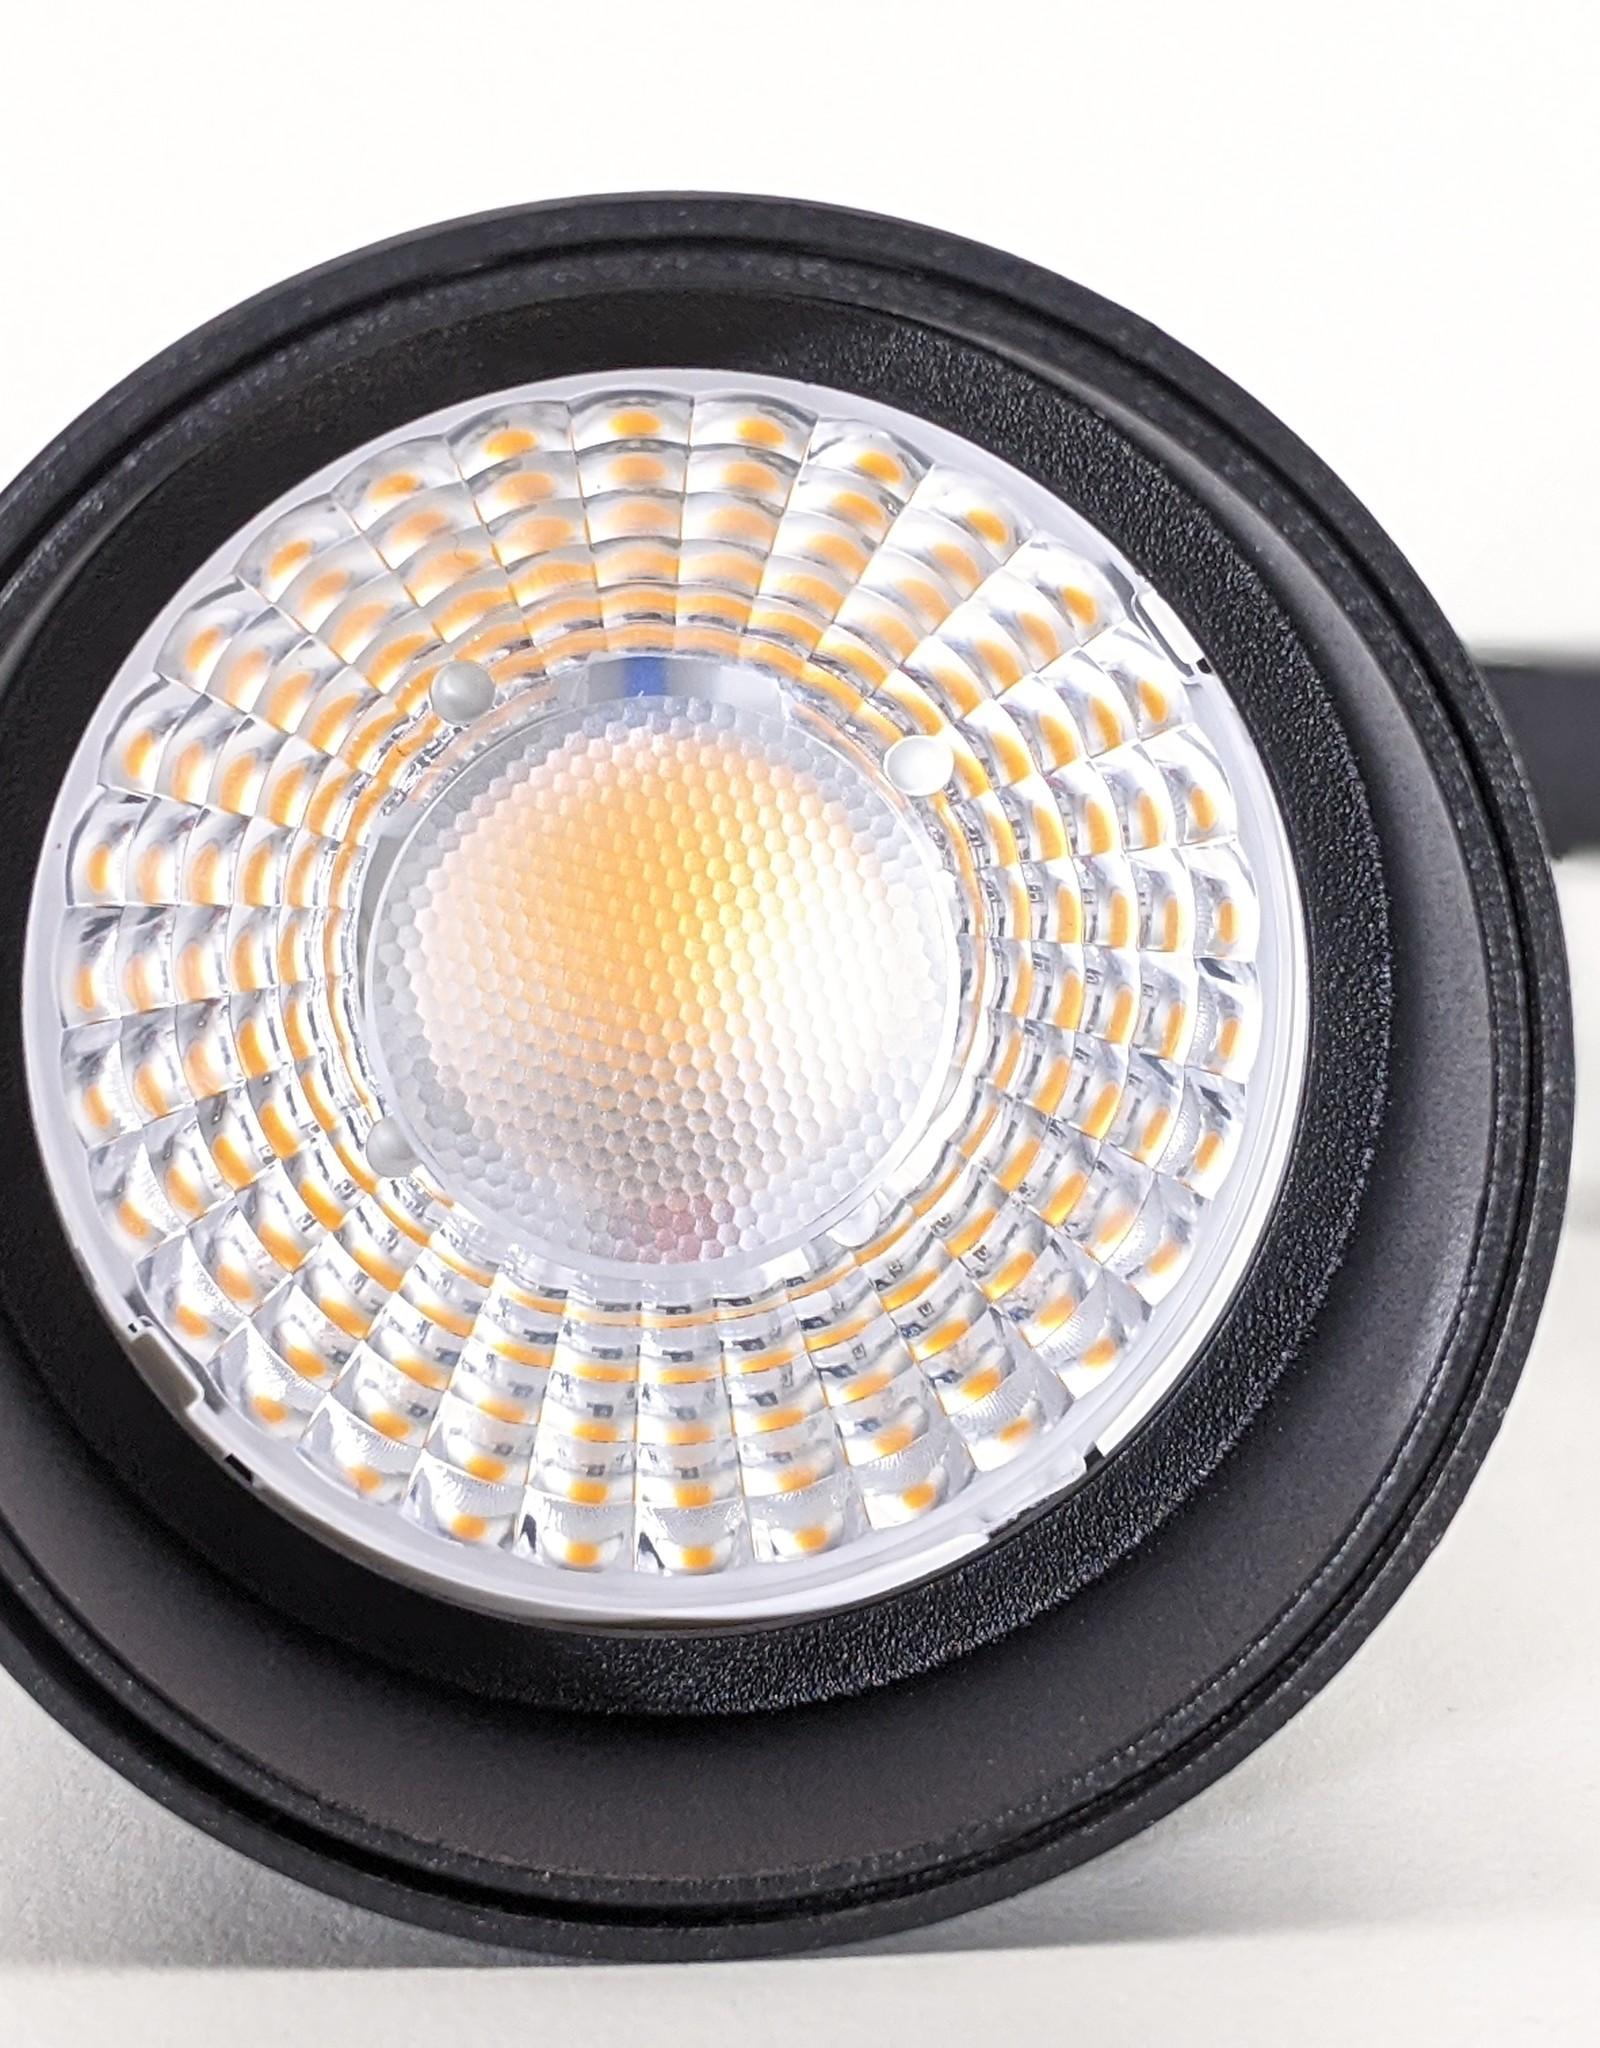 LedLed LED Tracklight 25W 2700k